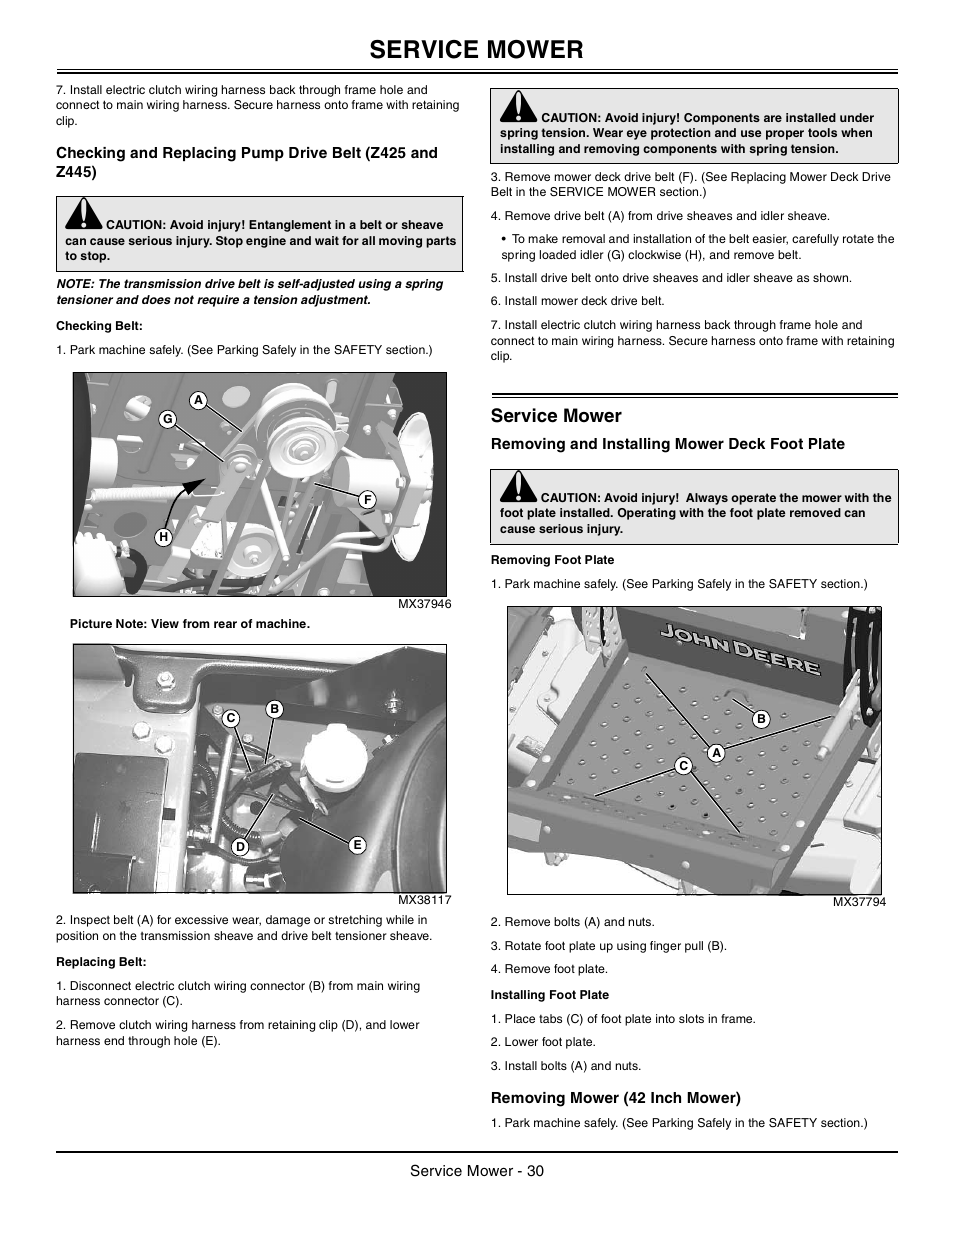 X324 Wiring Diagram John Deere Parts Wire Diagrams Lt160 Belt Replacement